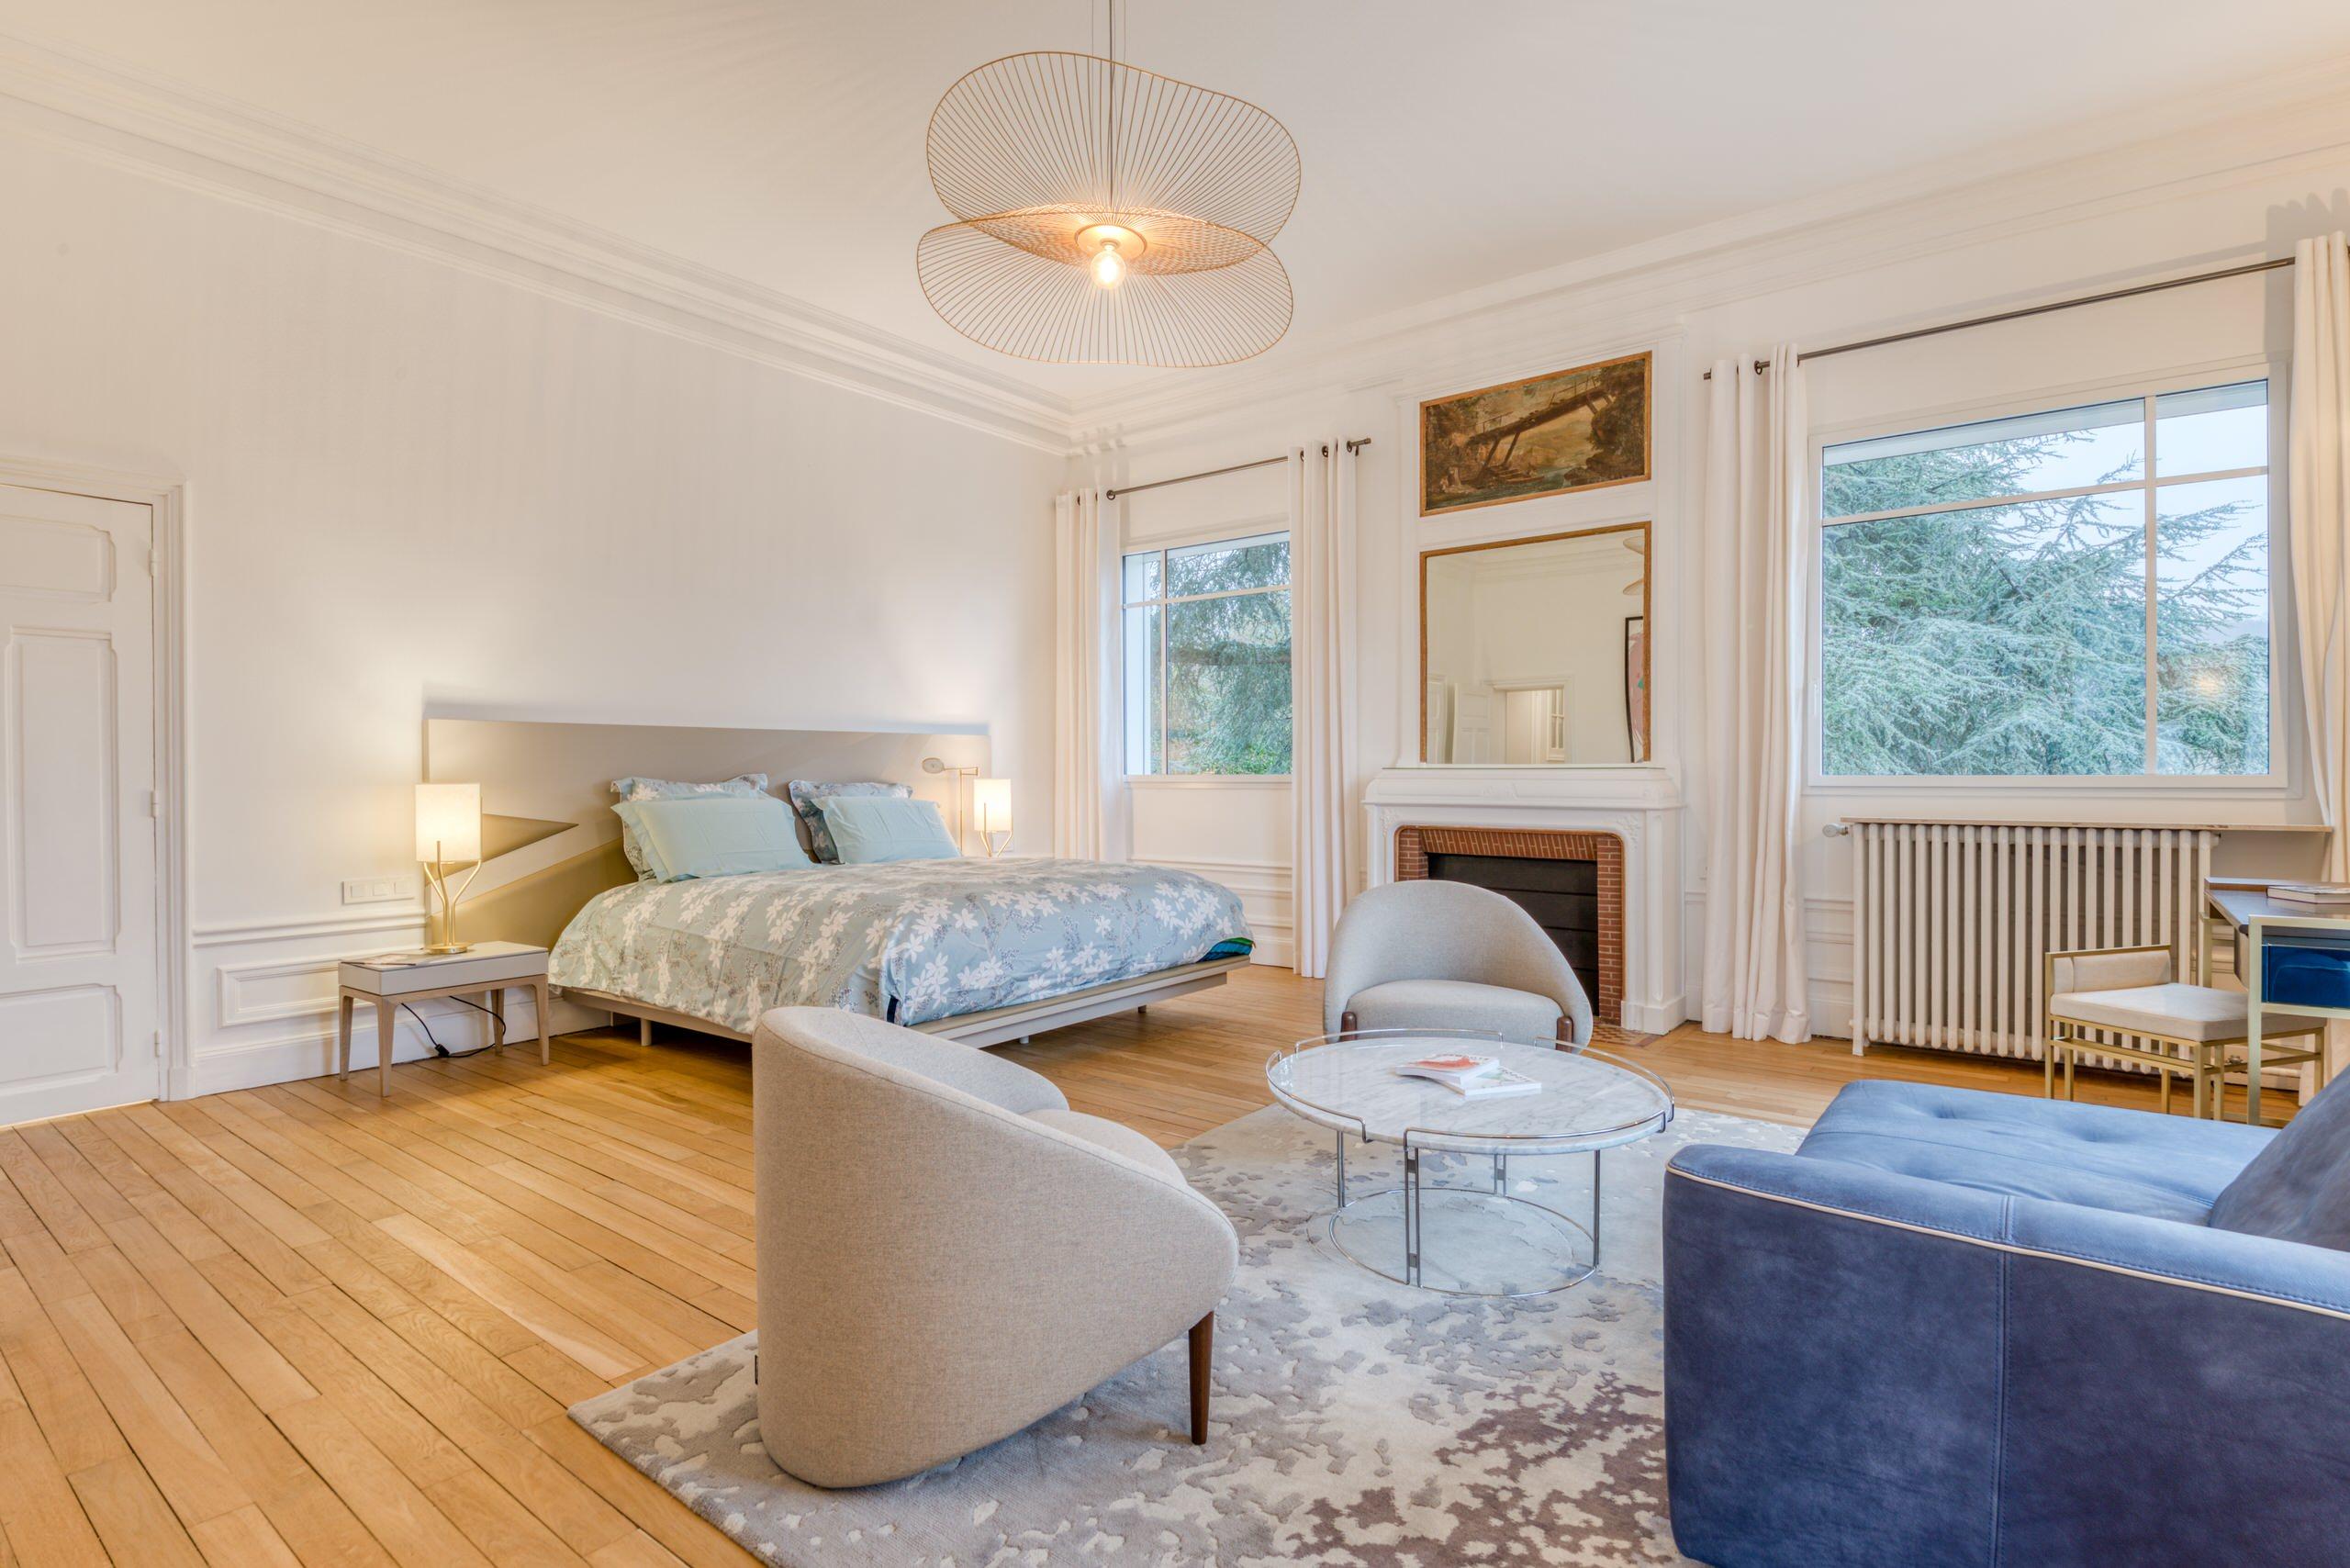 Villa de 650 m2 à Saint-Germain-en-Laye - La chambre Master